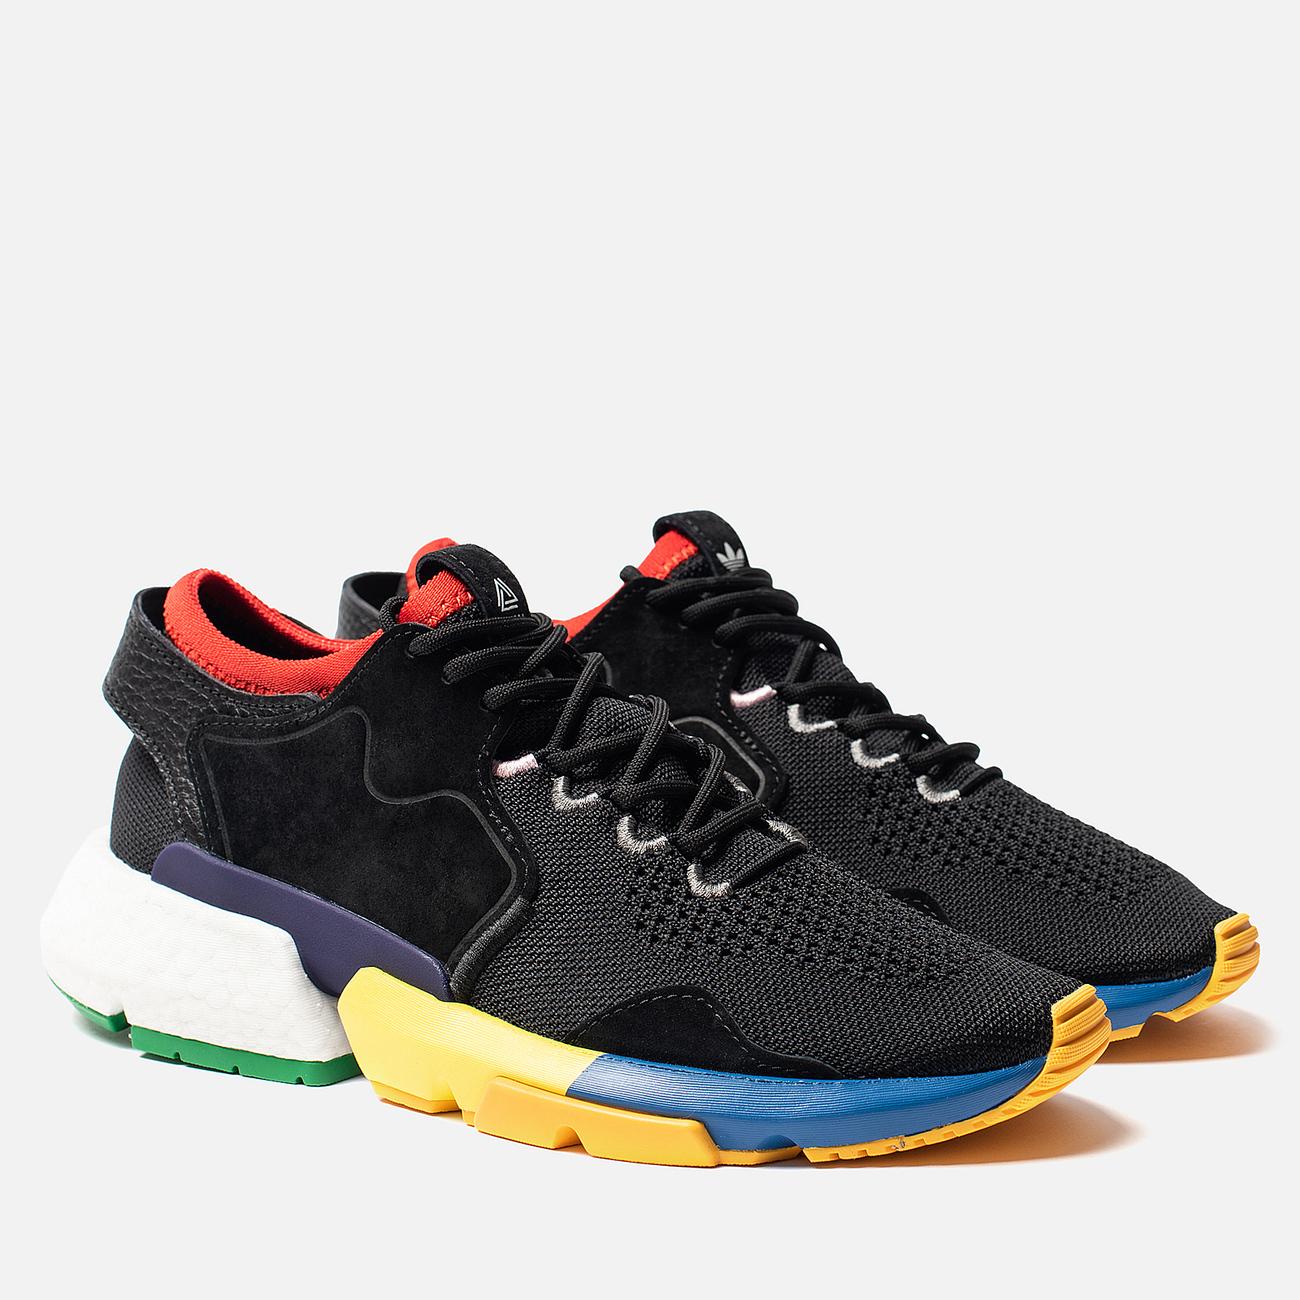 Кроссовки adidas Consortium x Social Status POD-S3.1 Core Black/Blue/Bright Yellow